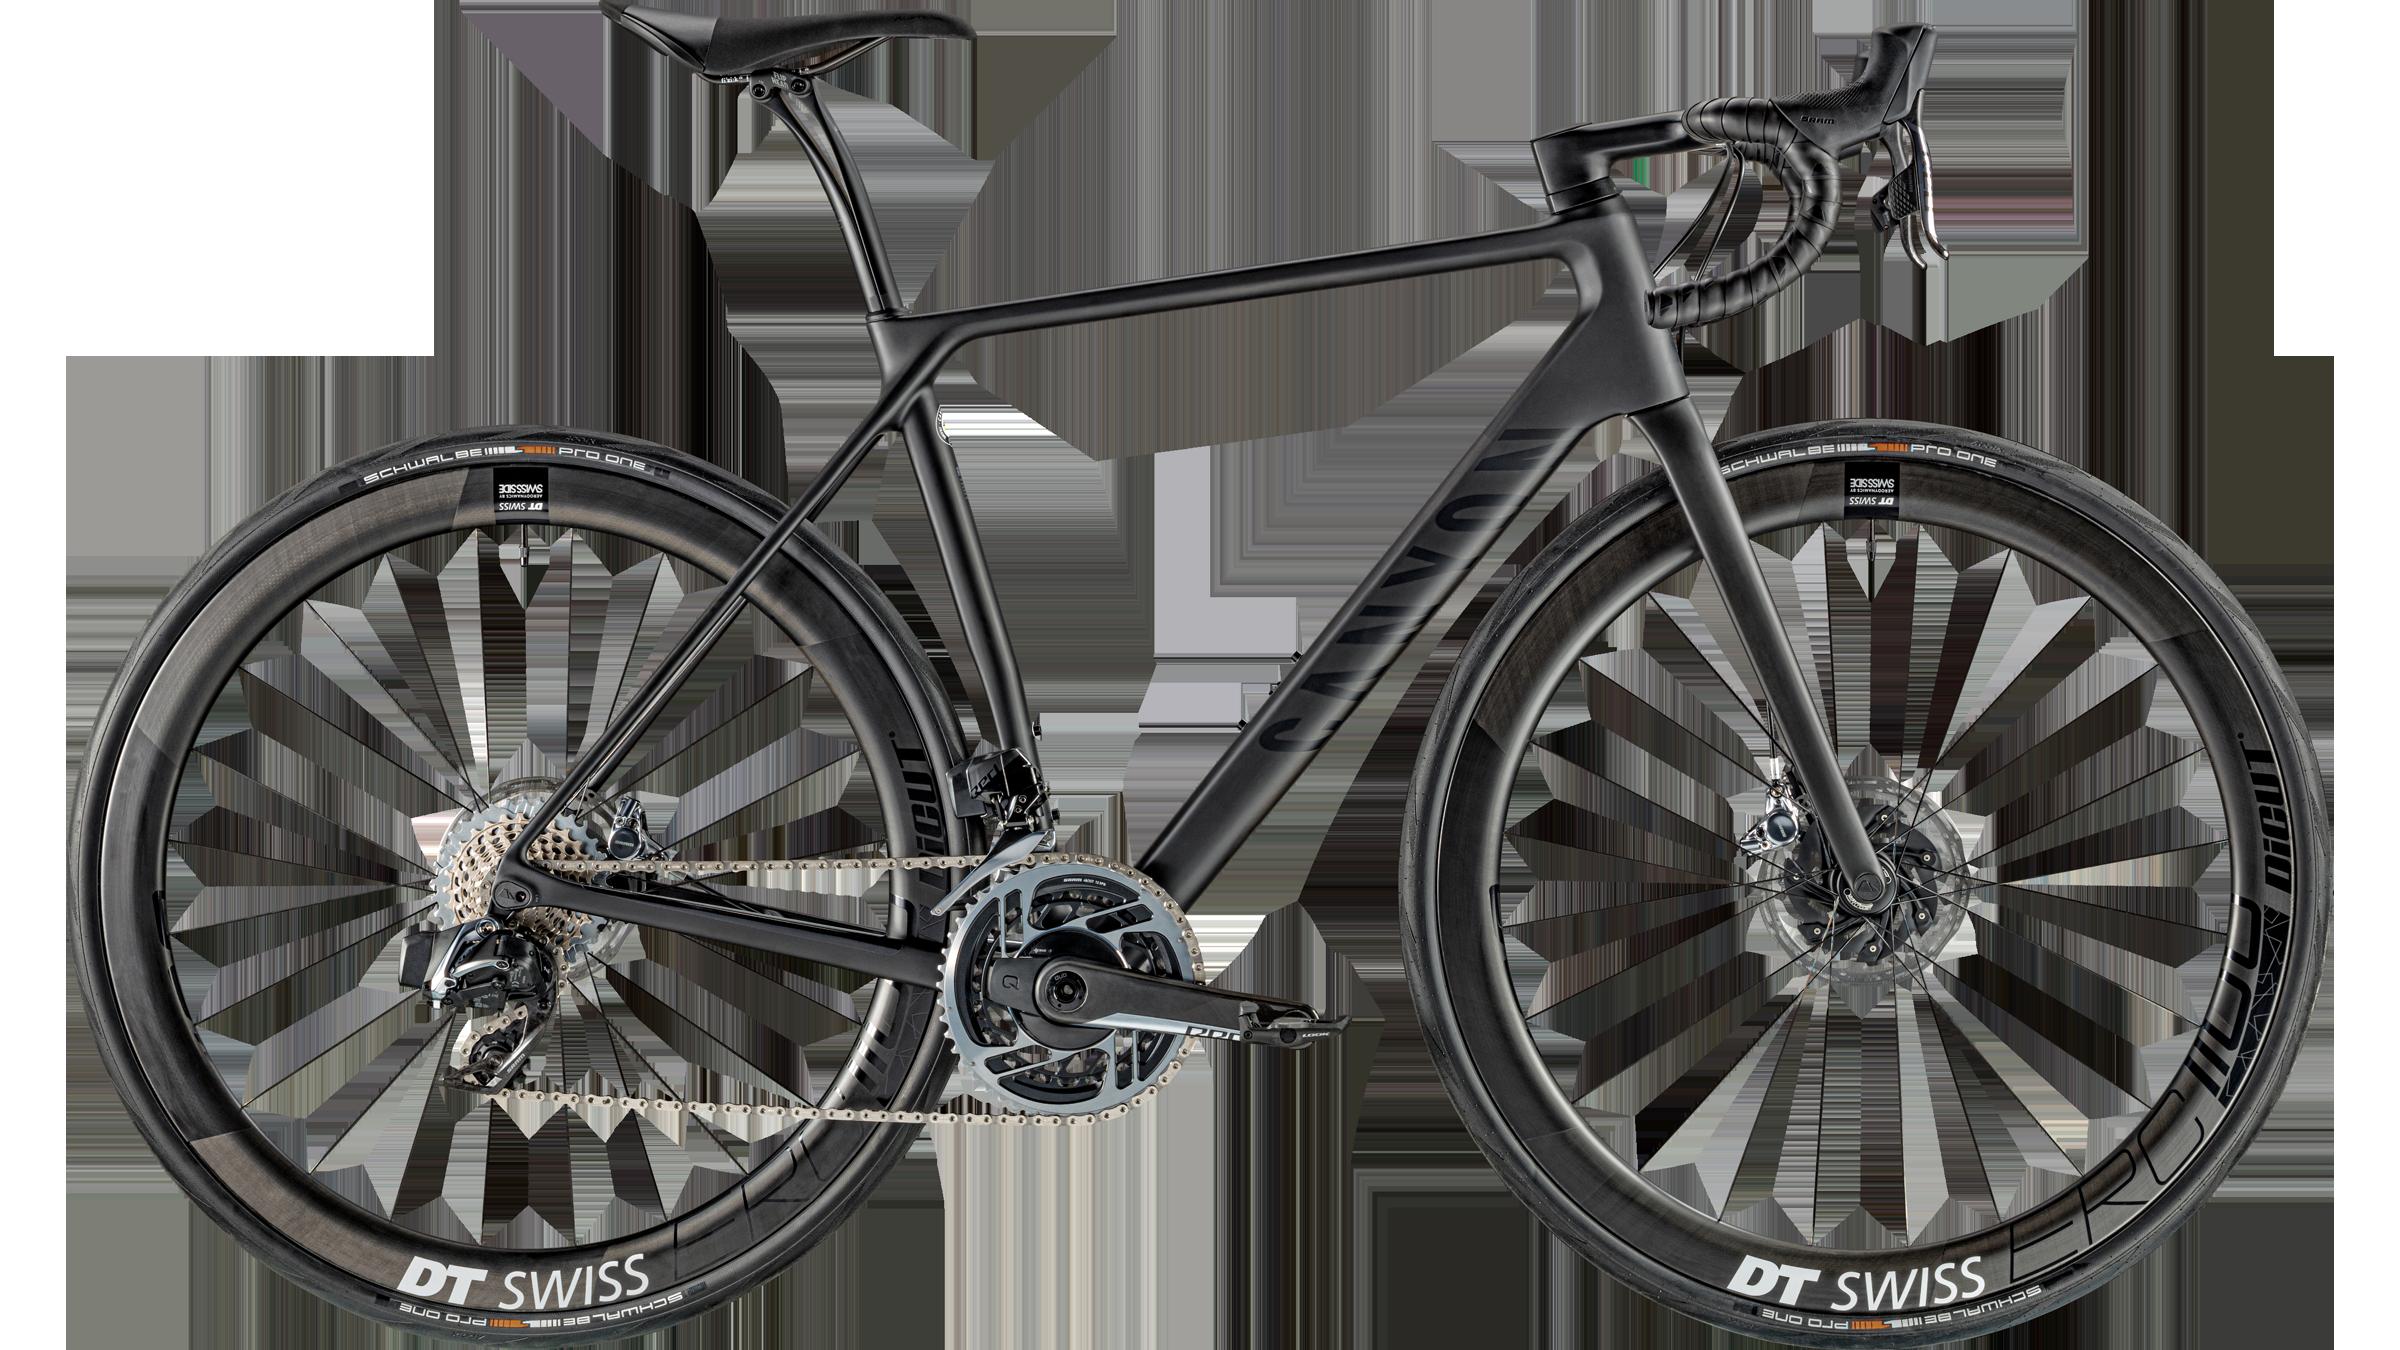 Endurance Road Bike Endurace Canyon Nz